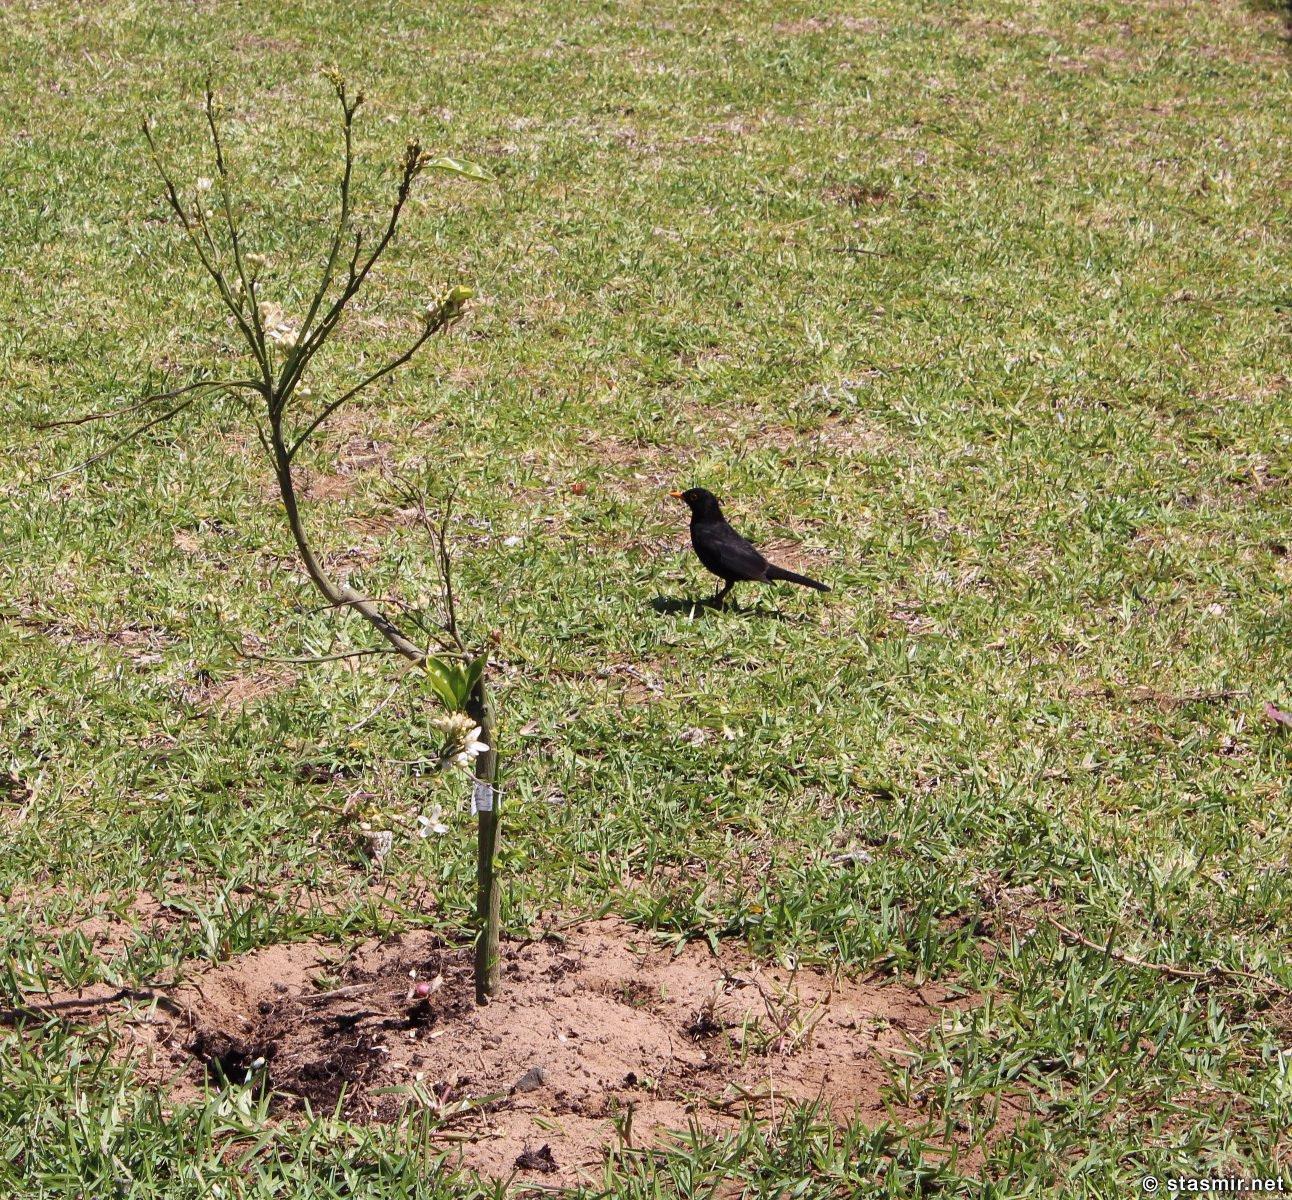 blackburd, common thrush, turdus, черный дрозд, фото Стасмир, photo Stasmir